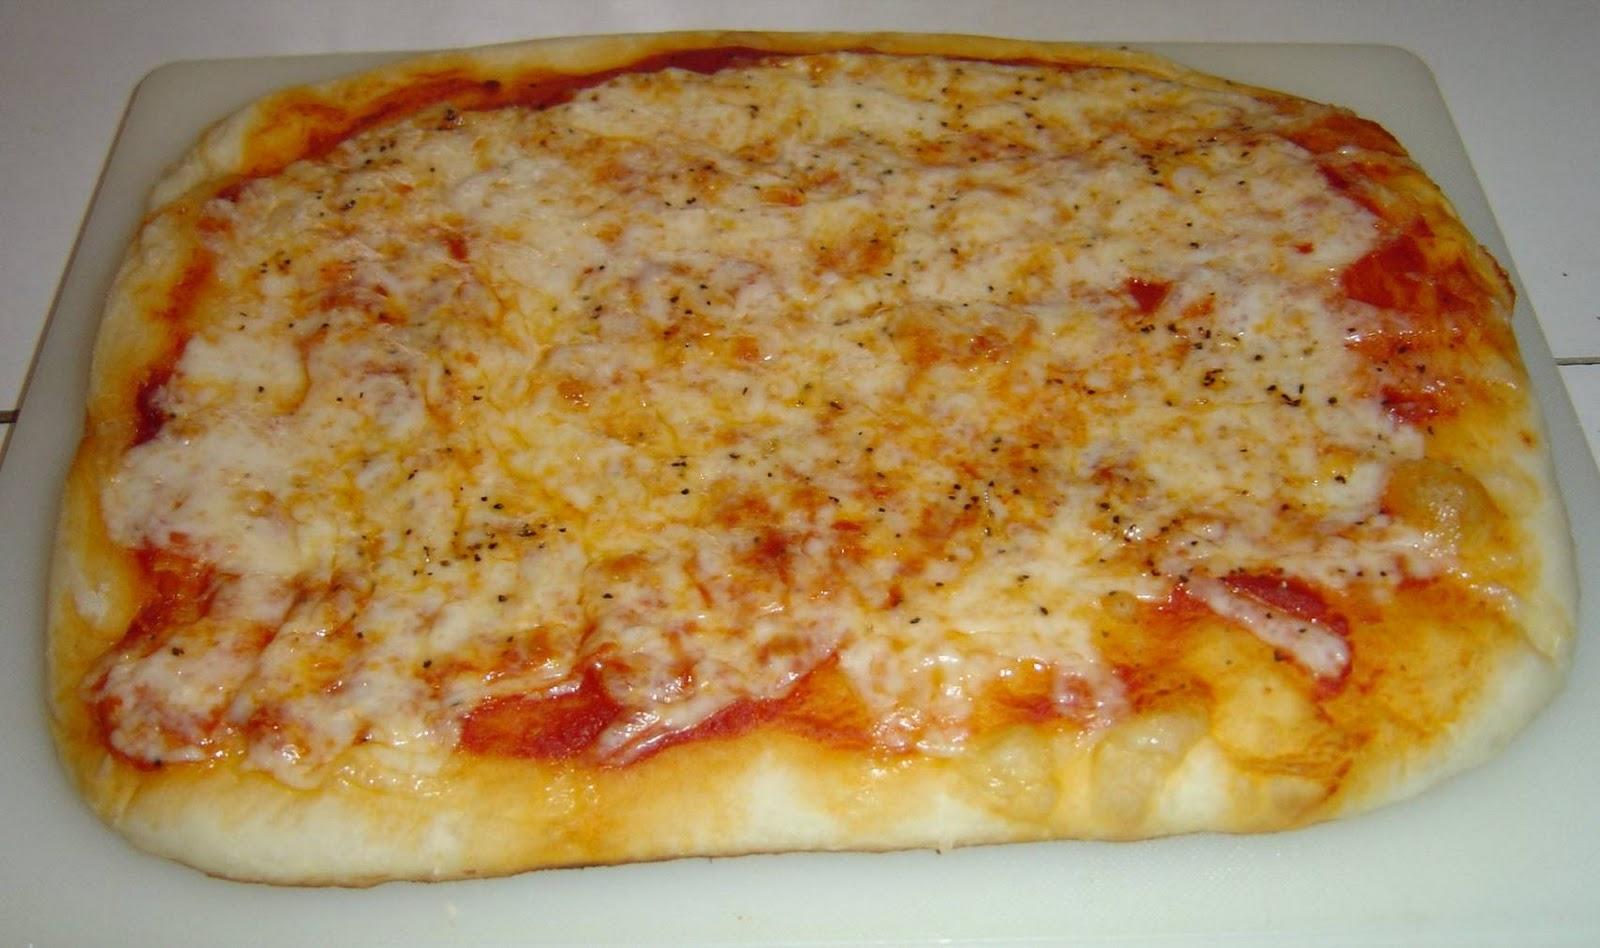 homemade pizza.jpeg